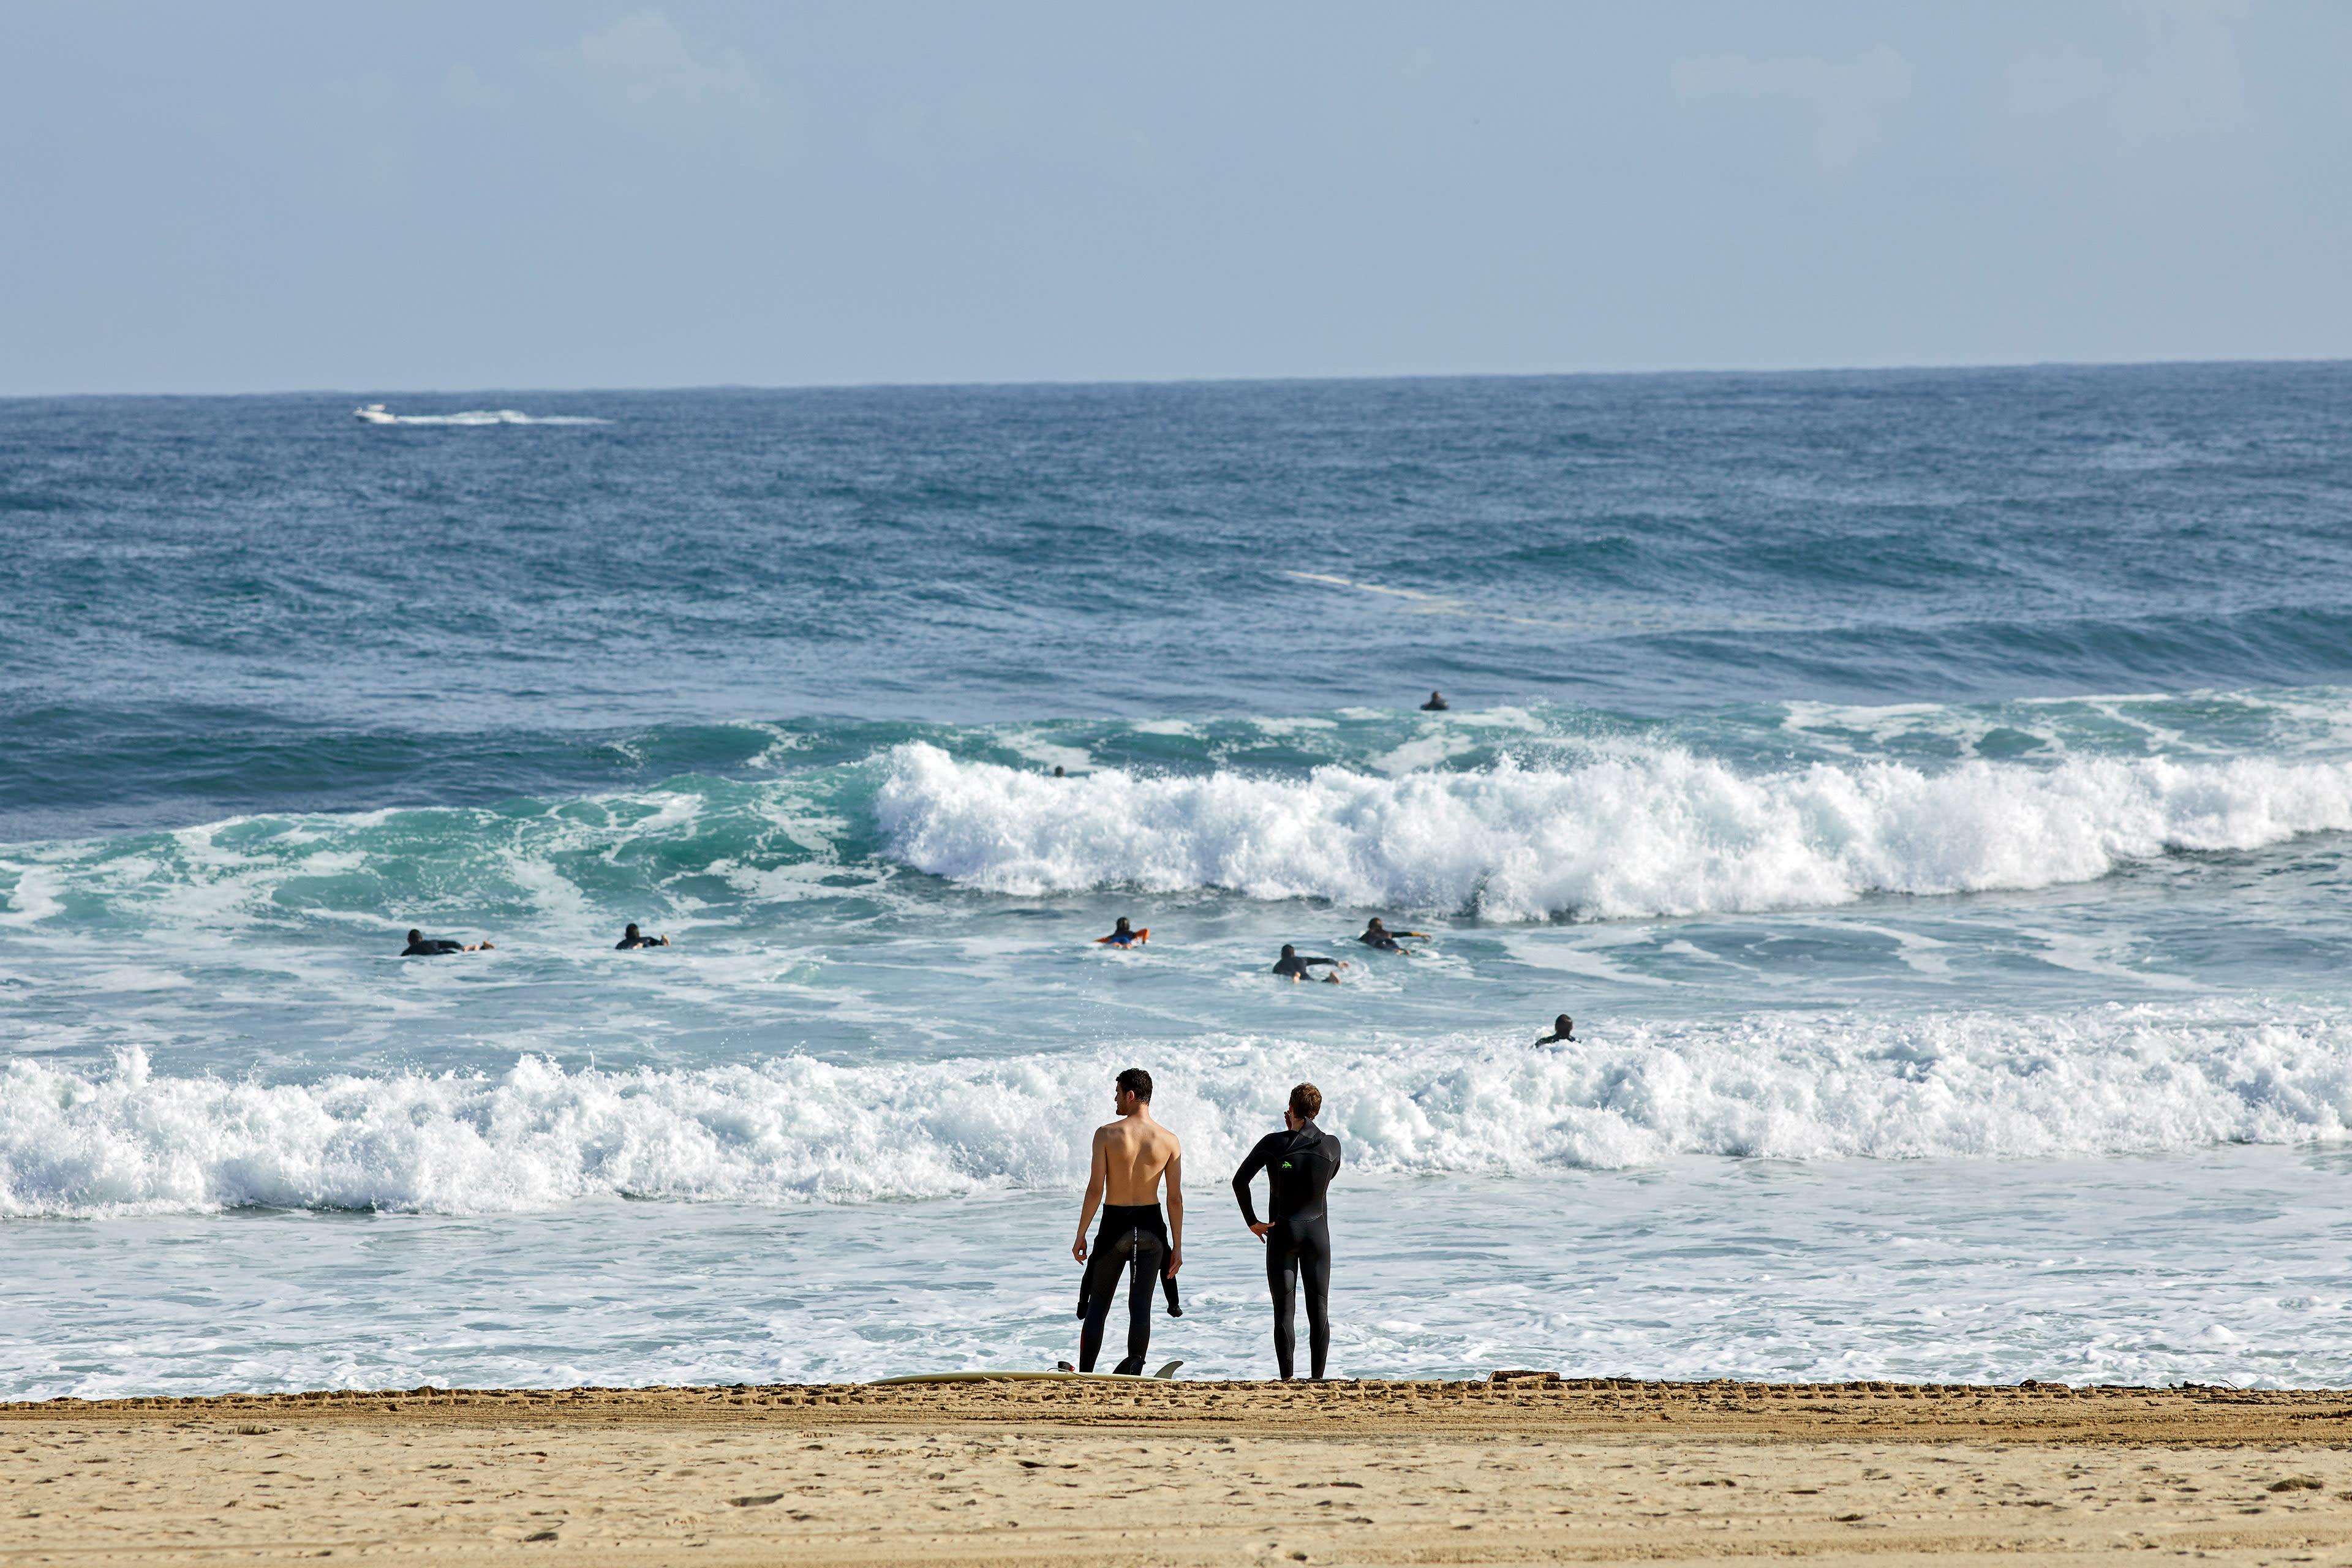 Richard Moran Beech Surf Skate Personal 007